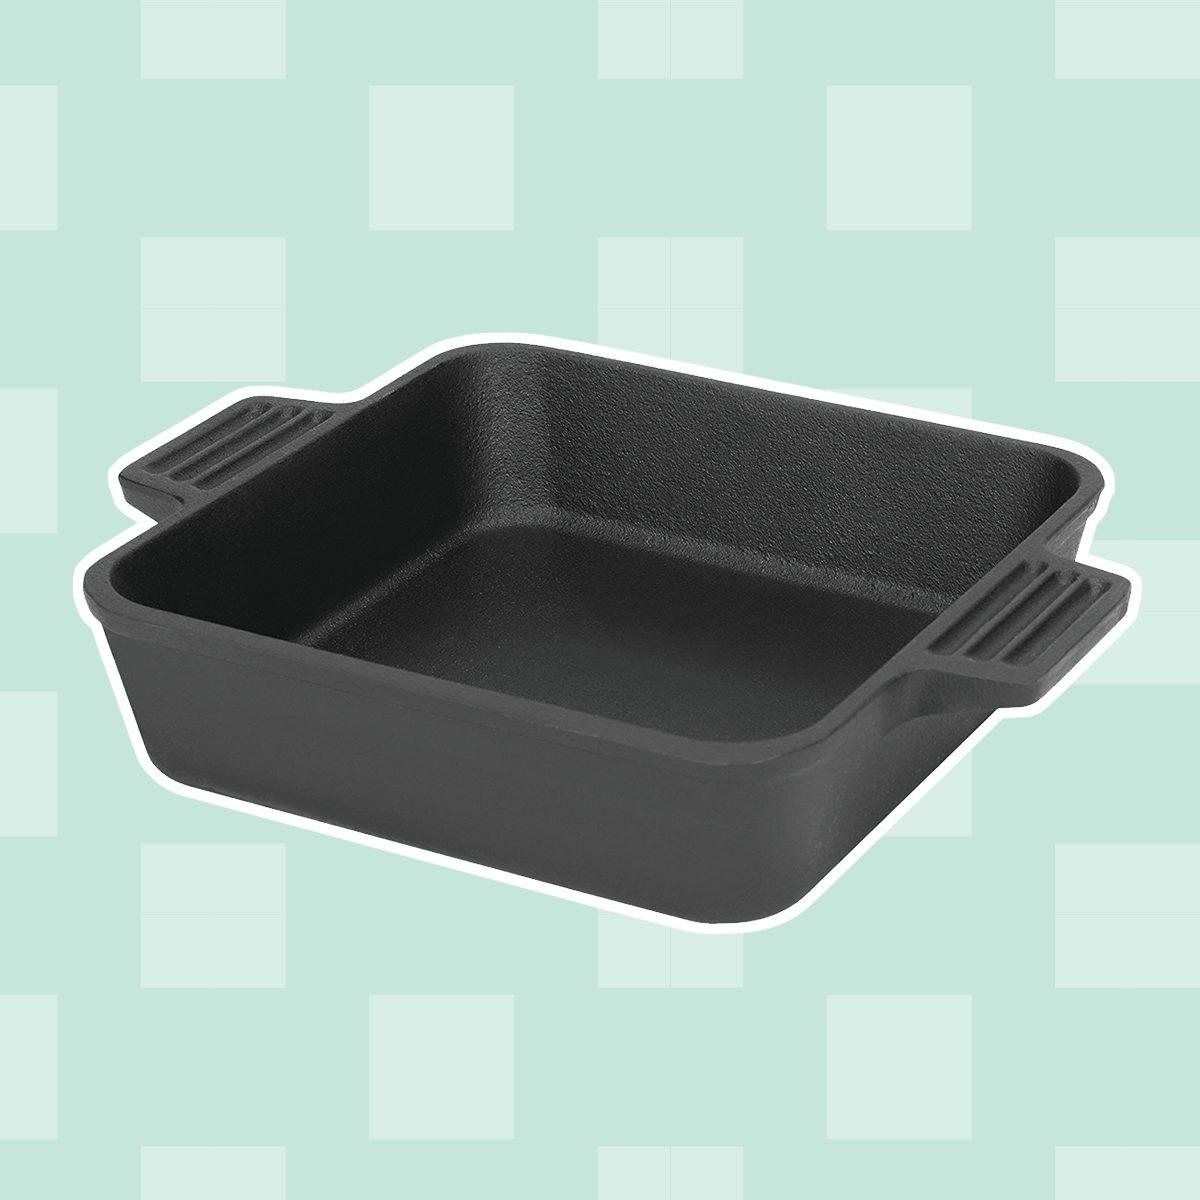 Cast Iron Baking Pan